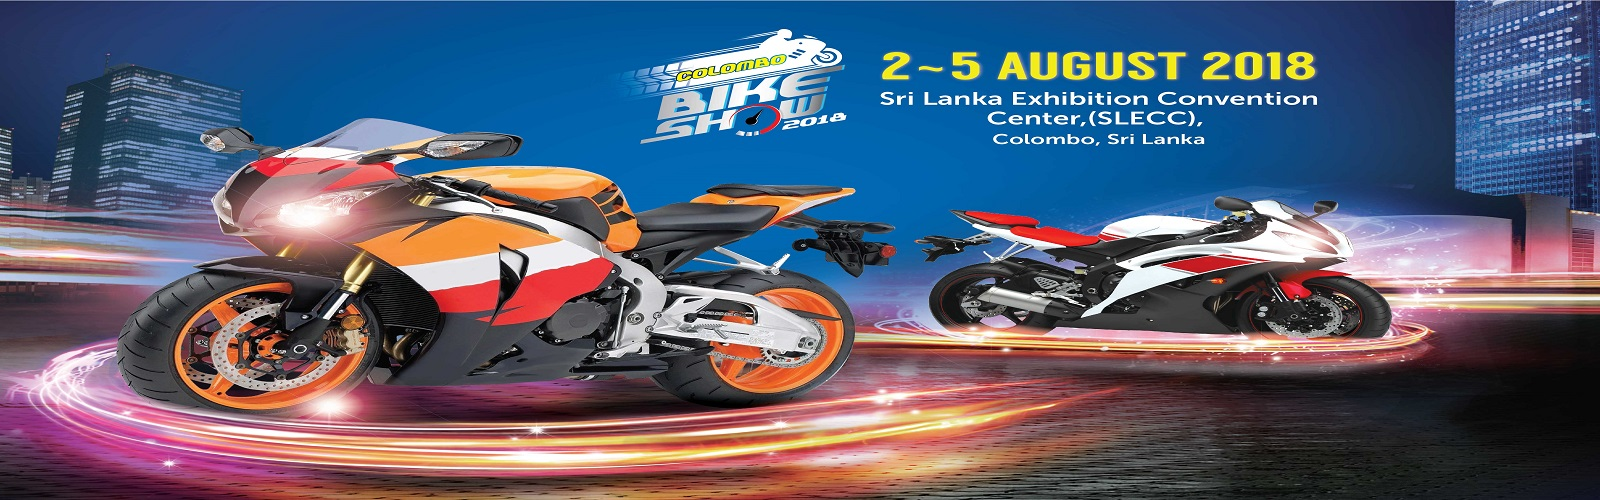 Colombo Bike Show 2018